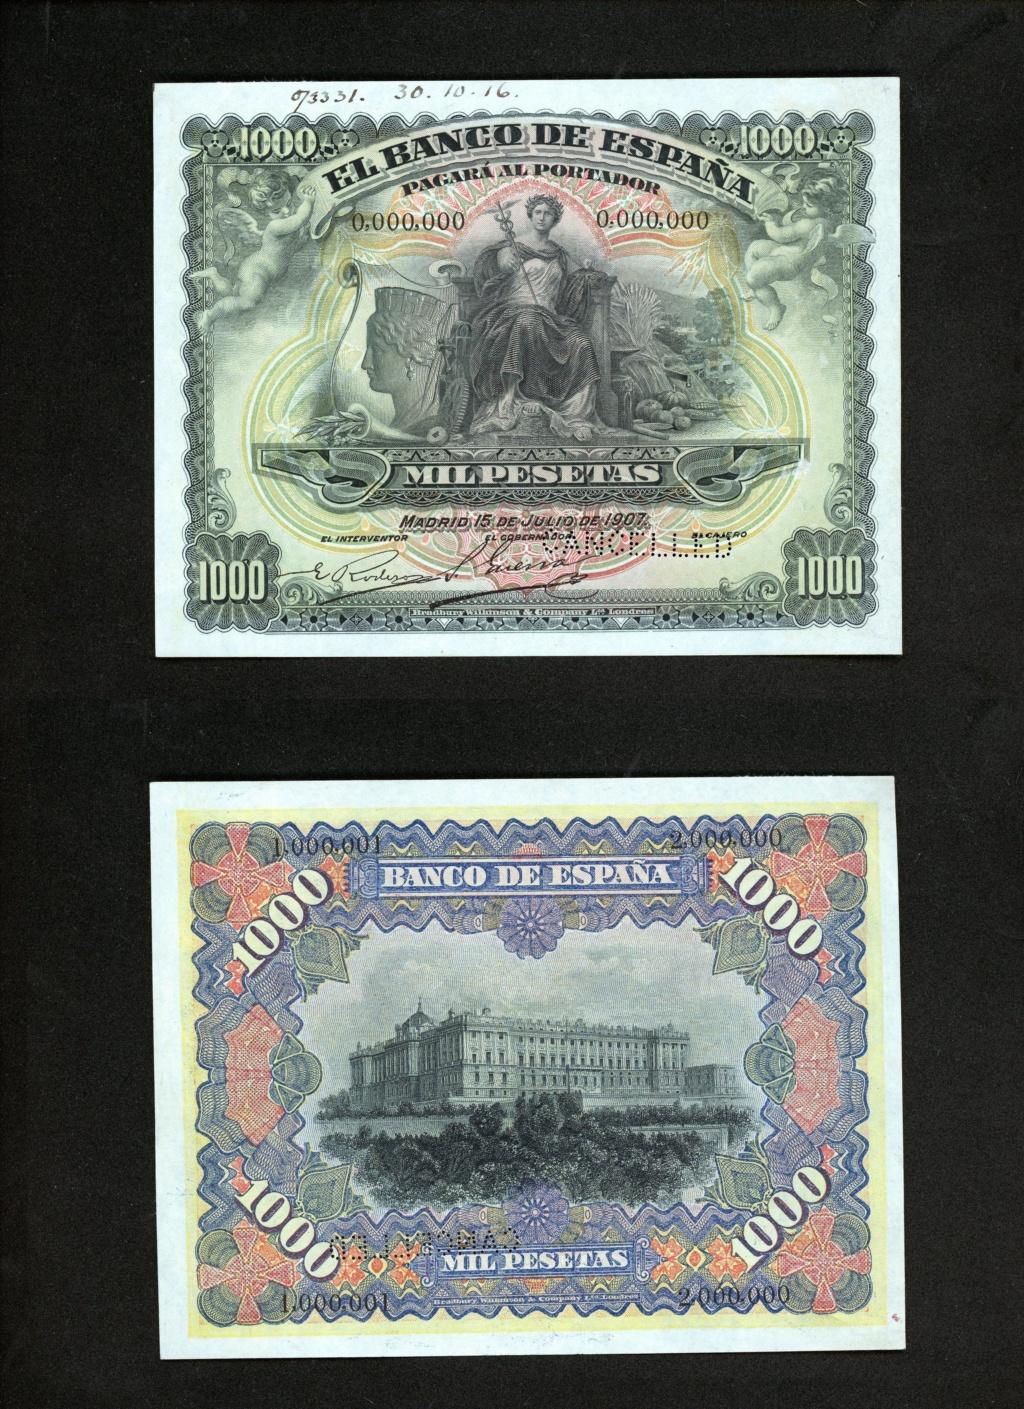 Billetes GRANDES y BONITOS 2d07a610